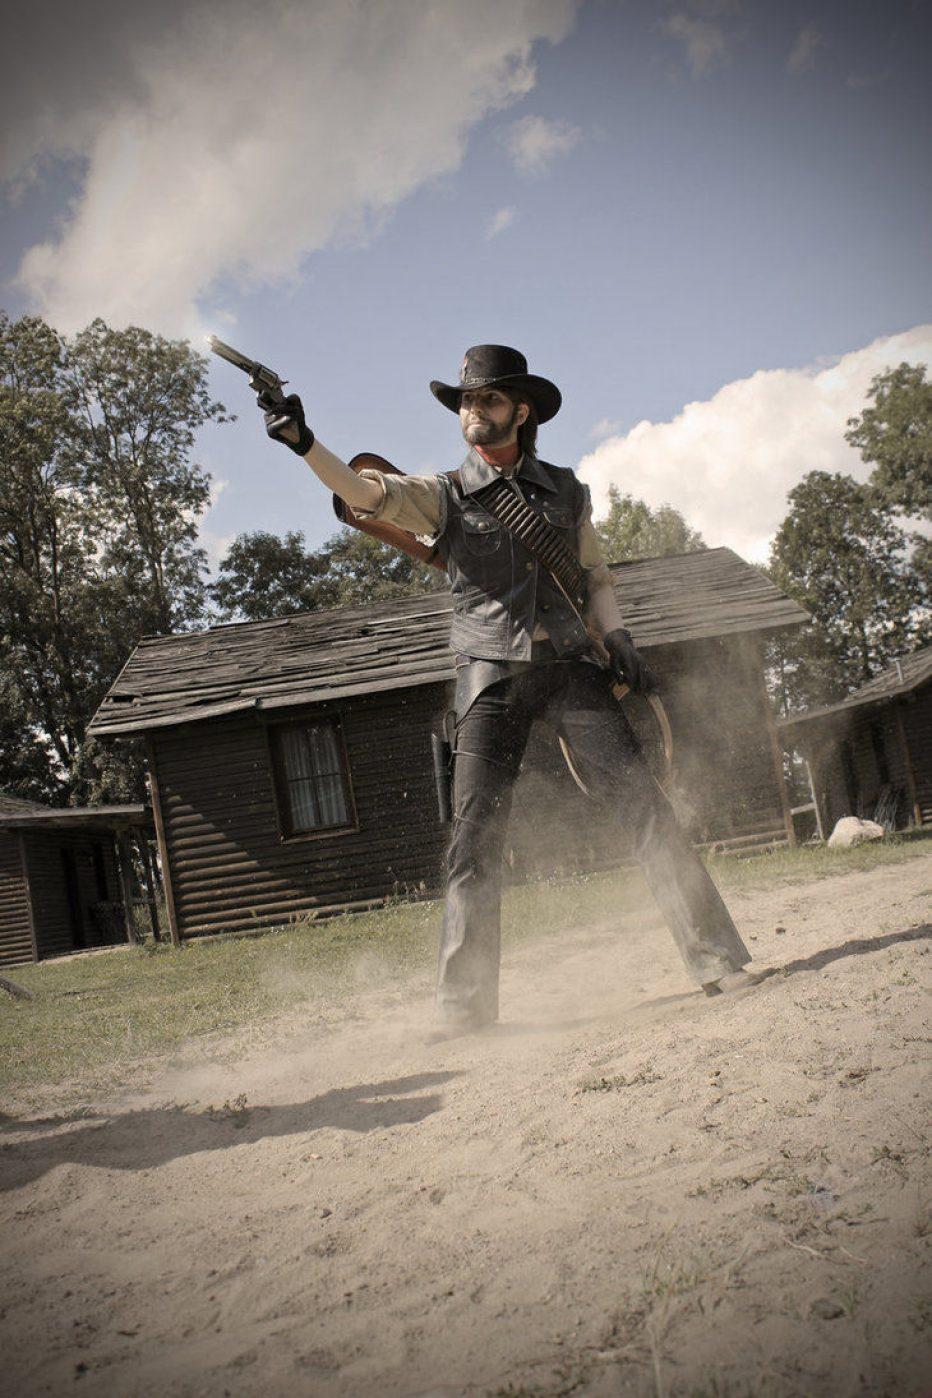 Red-Dead-Redemption-John-Marston-Cosplay-Gamers-Heroes-6.jpg